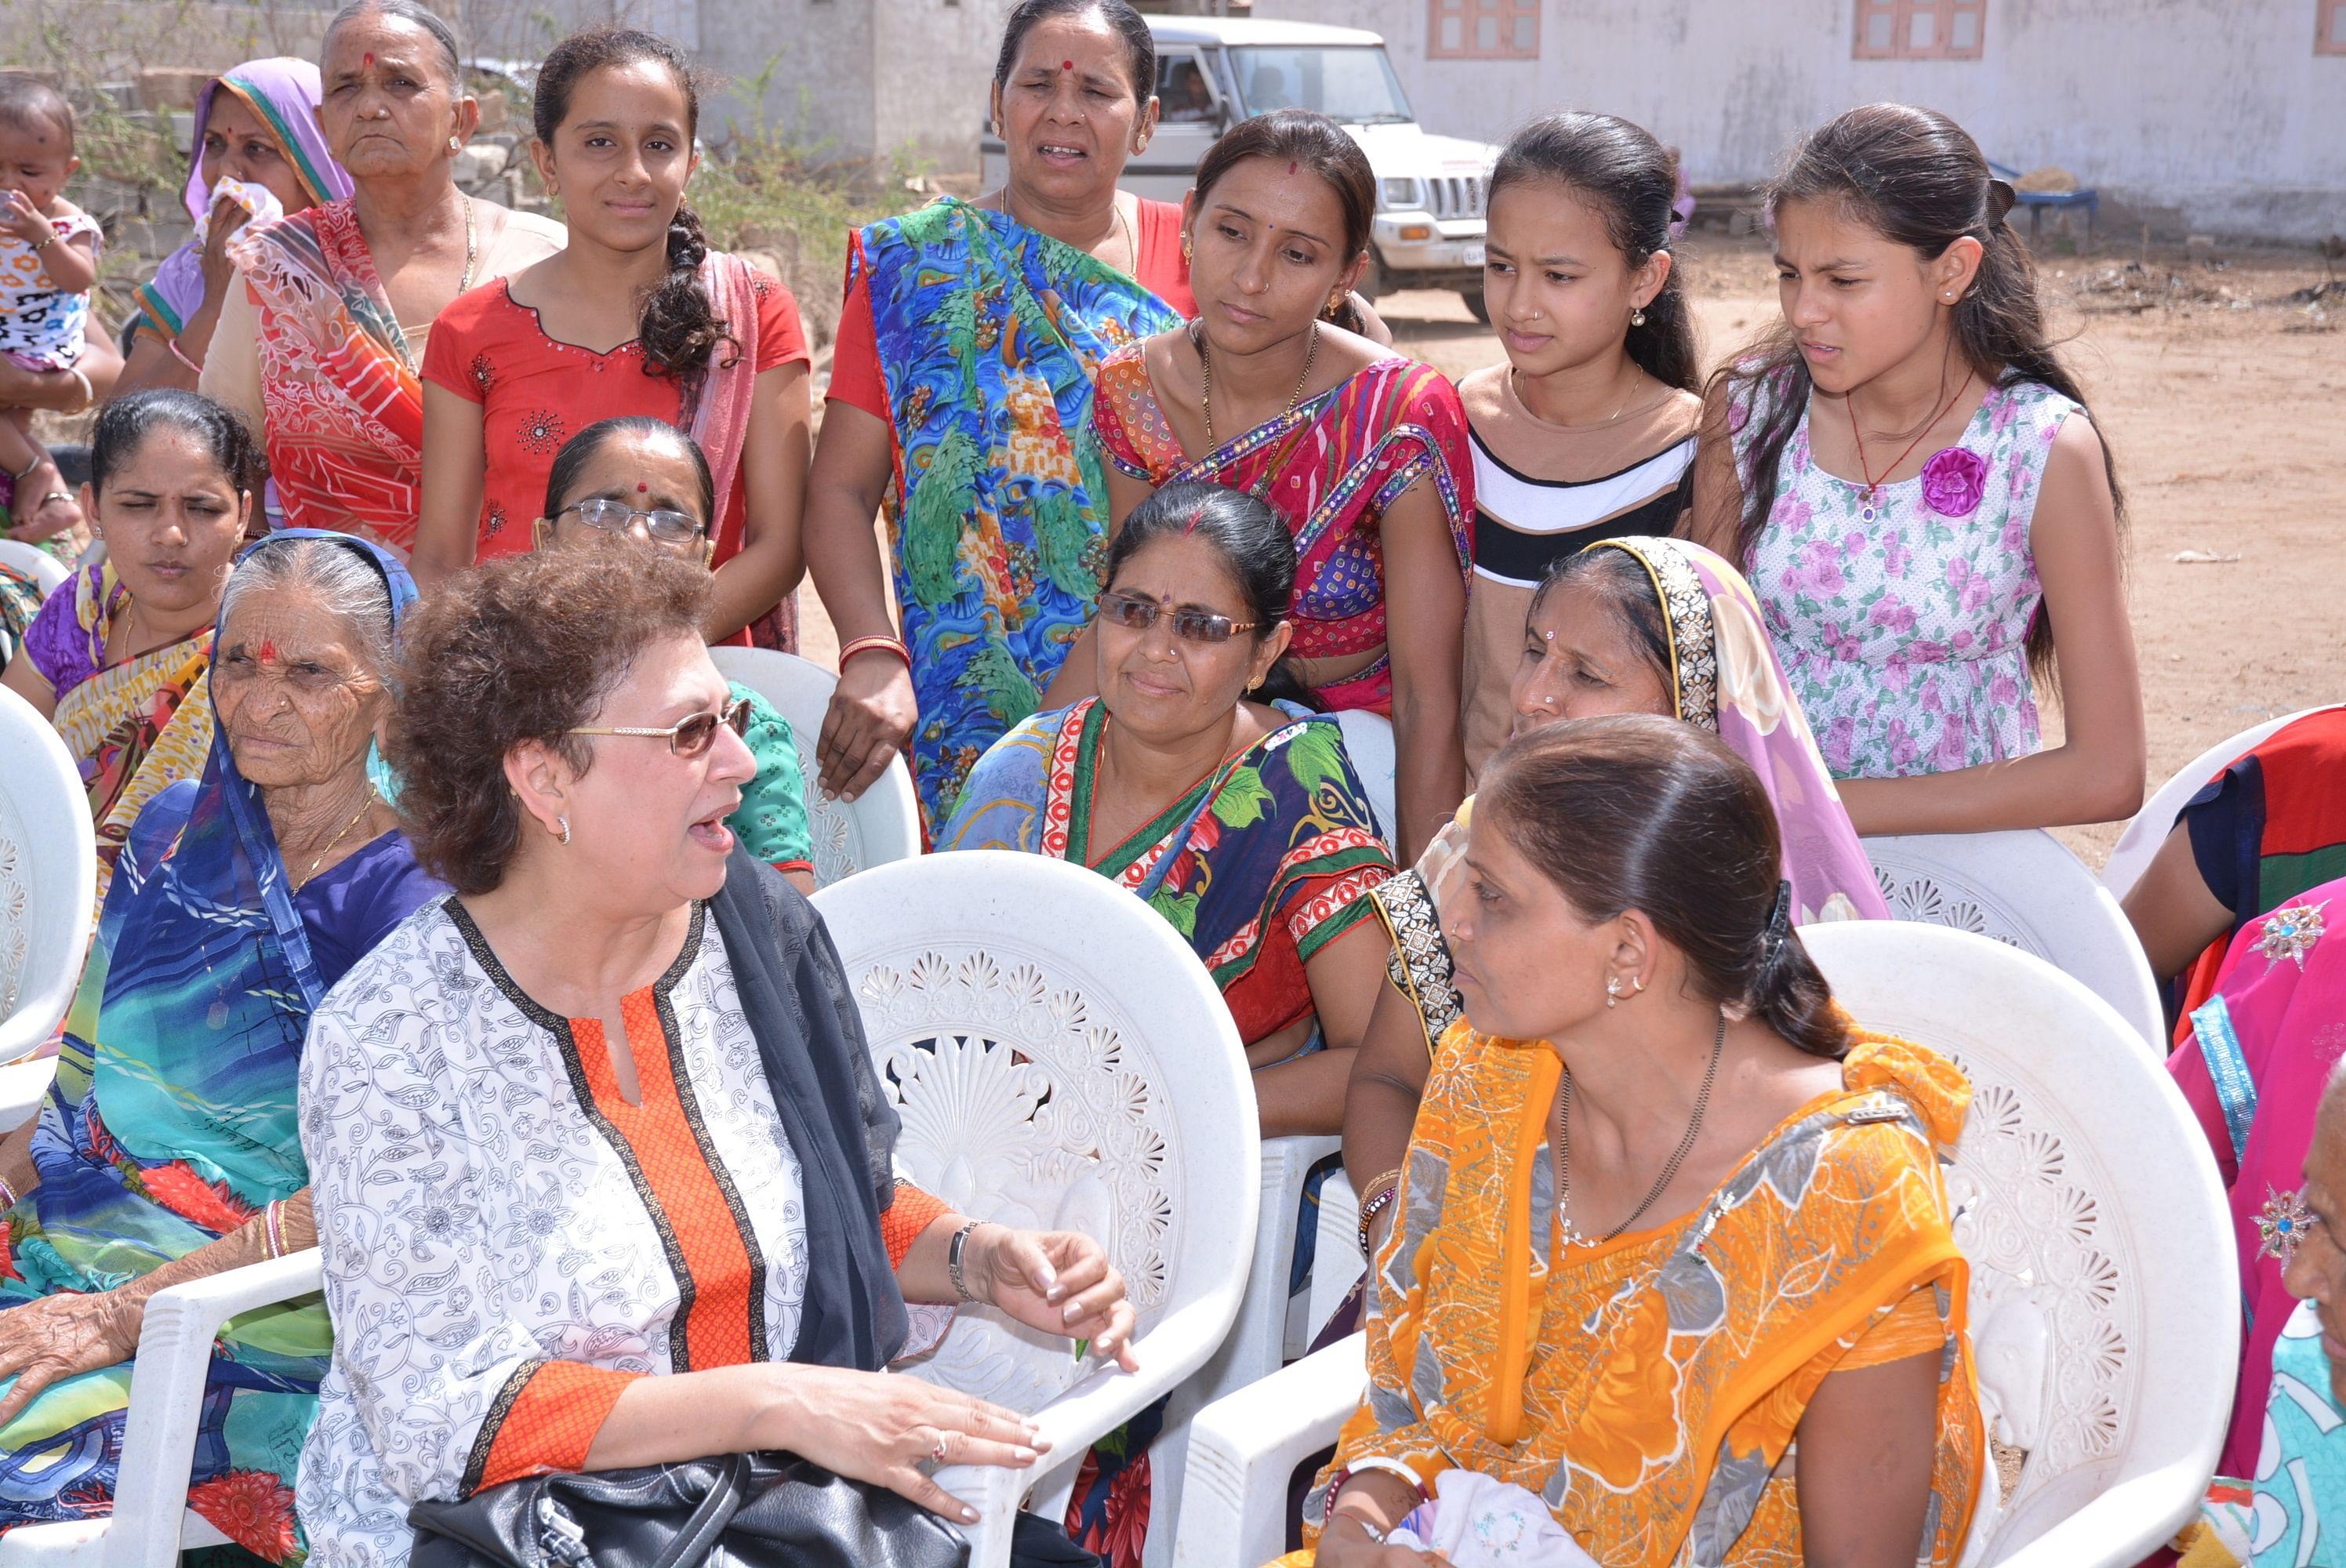 Happy residents of Gandhigram